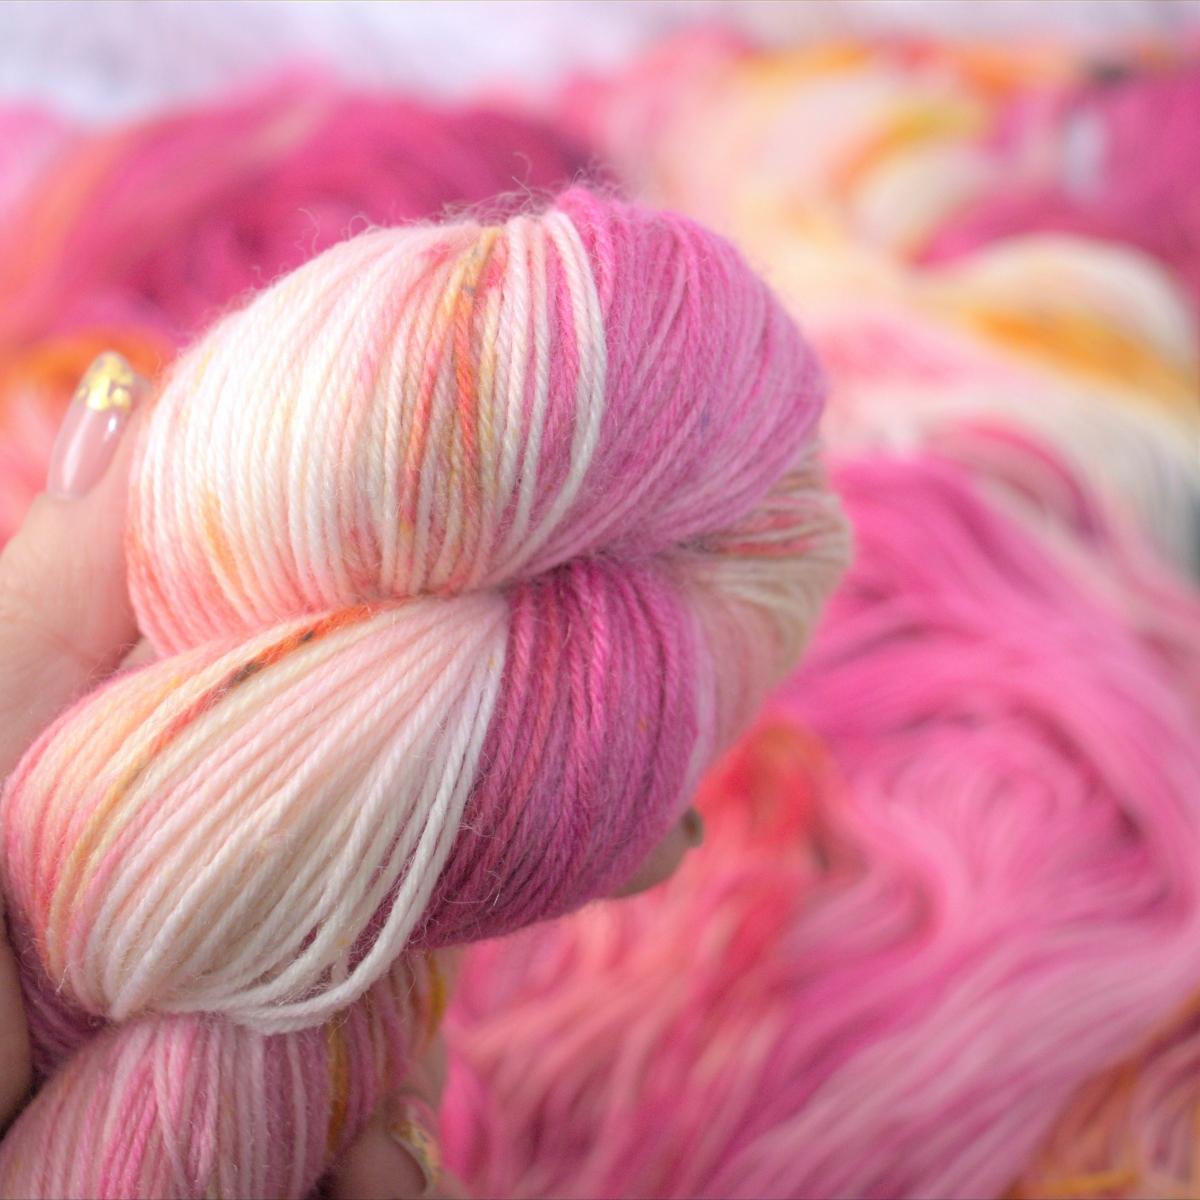 woodico.pro hand dyed yarn 052 copy 1 1200x1200 - Hand dyed yarn / 053